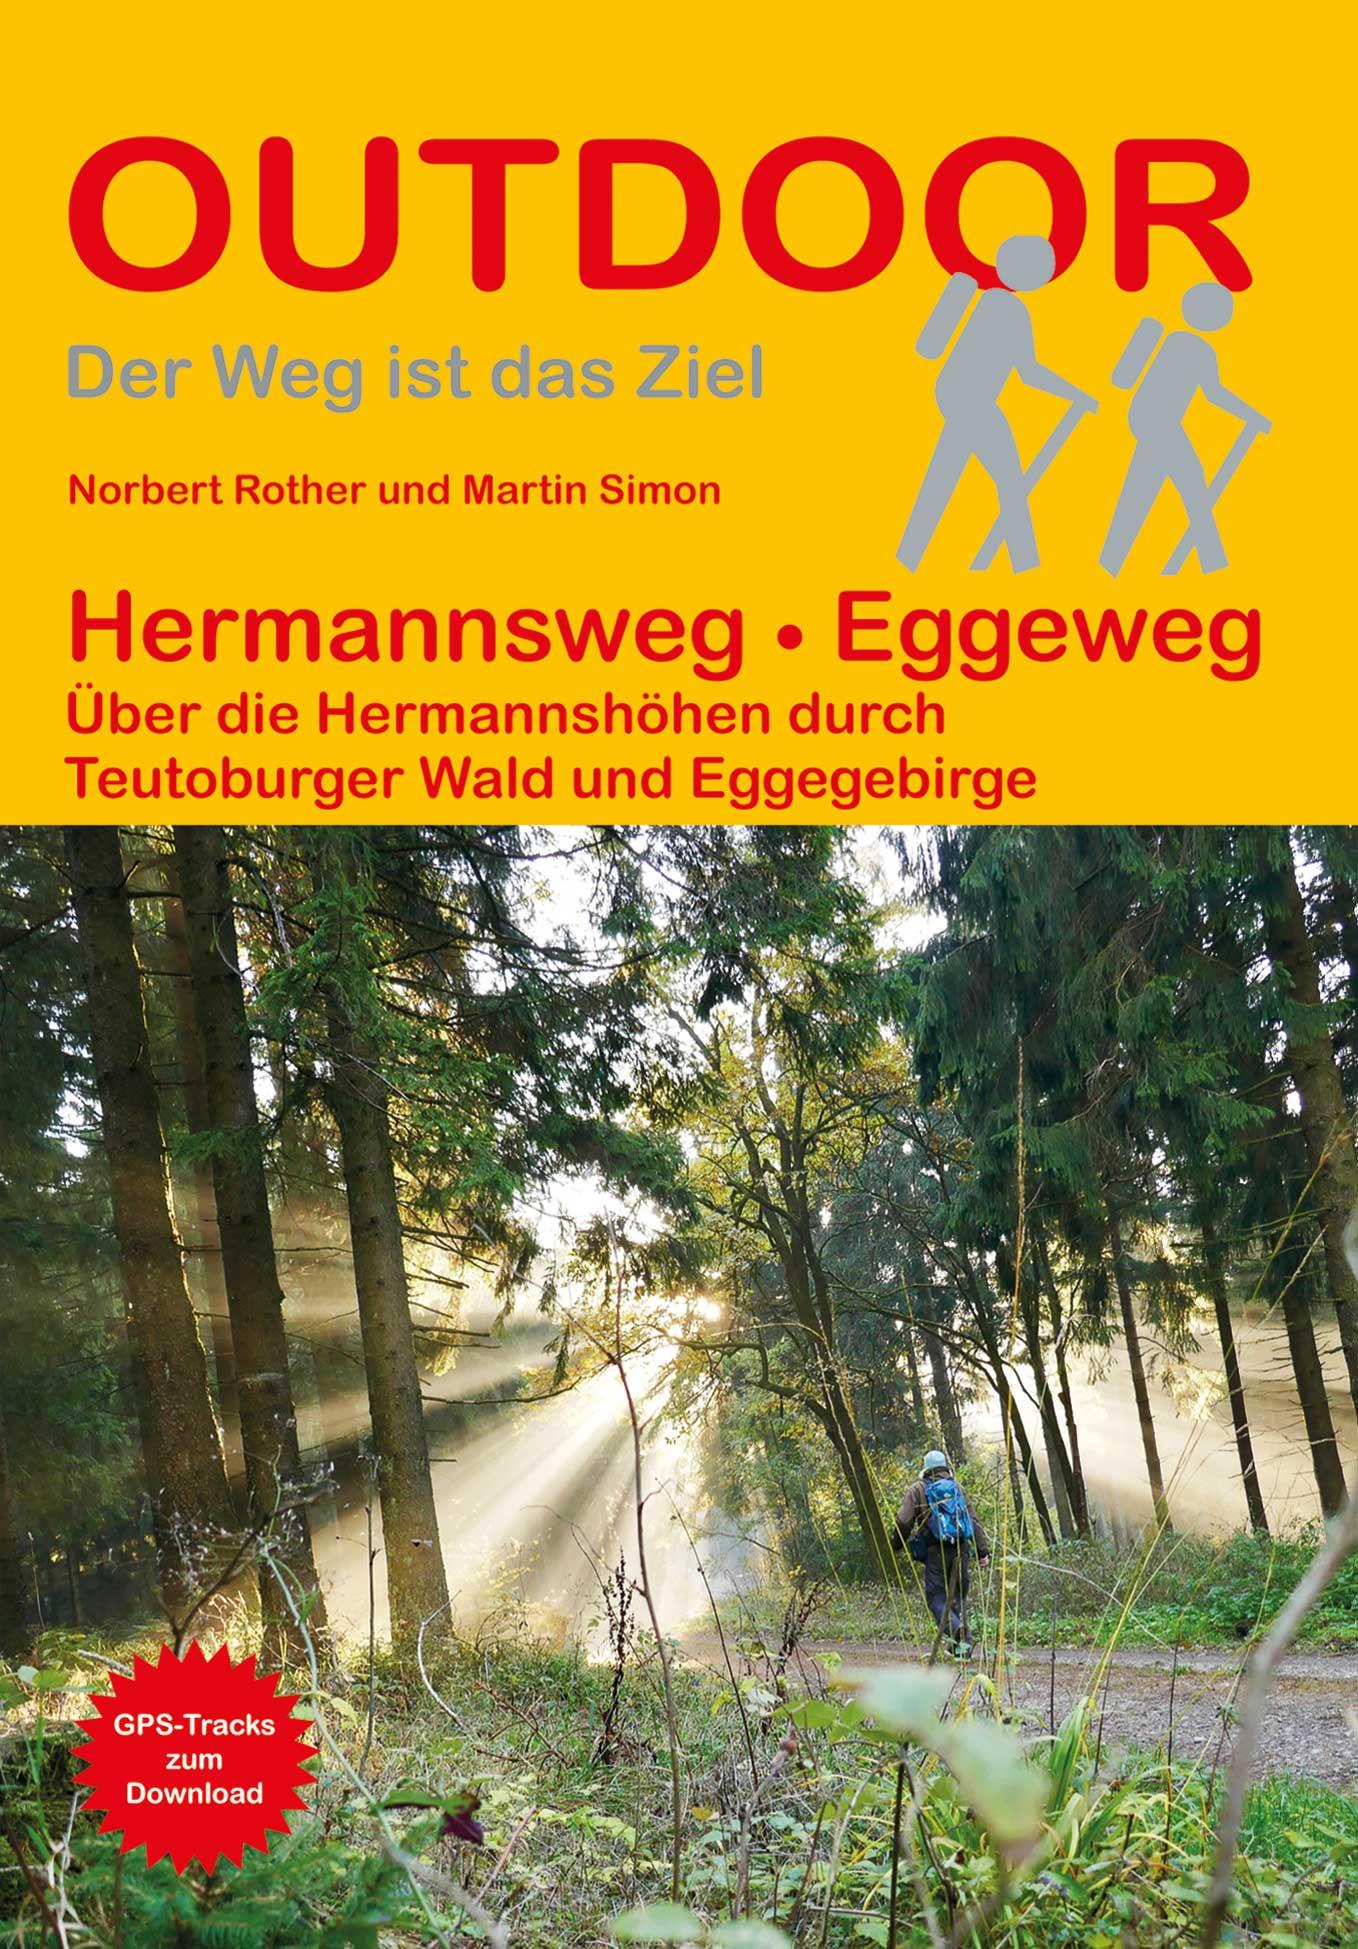 Hermannsweg - Eggeweg | wandelgids (Duitstalig) 9783866866218  Conrad Stein Verlag Outdoor - Der Weg ist das Ziel  Meerdaagse wandelroutes, Wandelgidsen Teutoburger Woud & Ostwestfalen